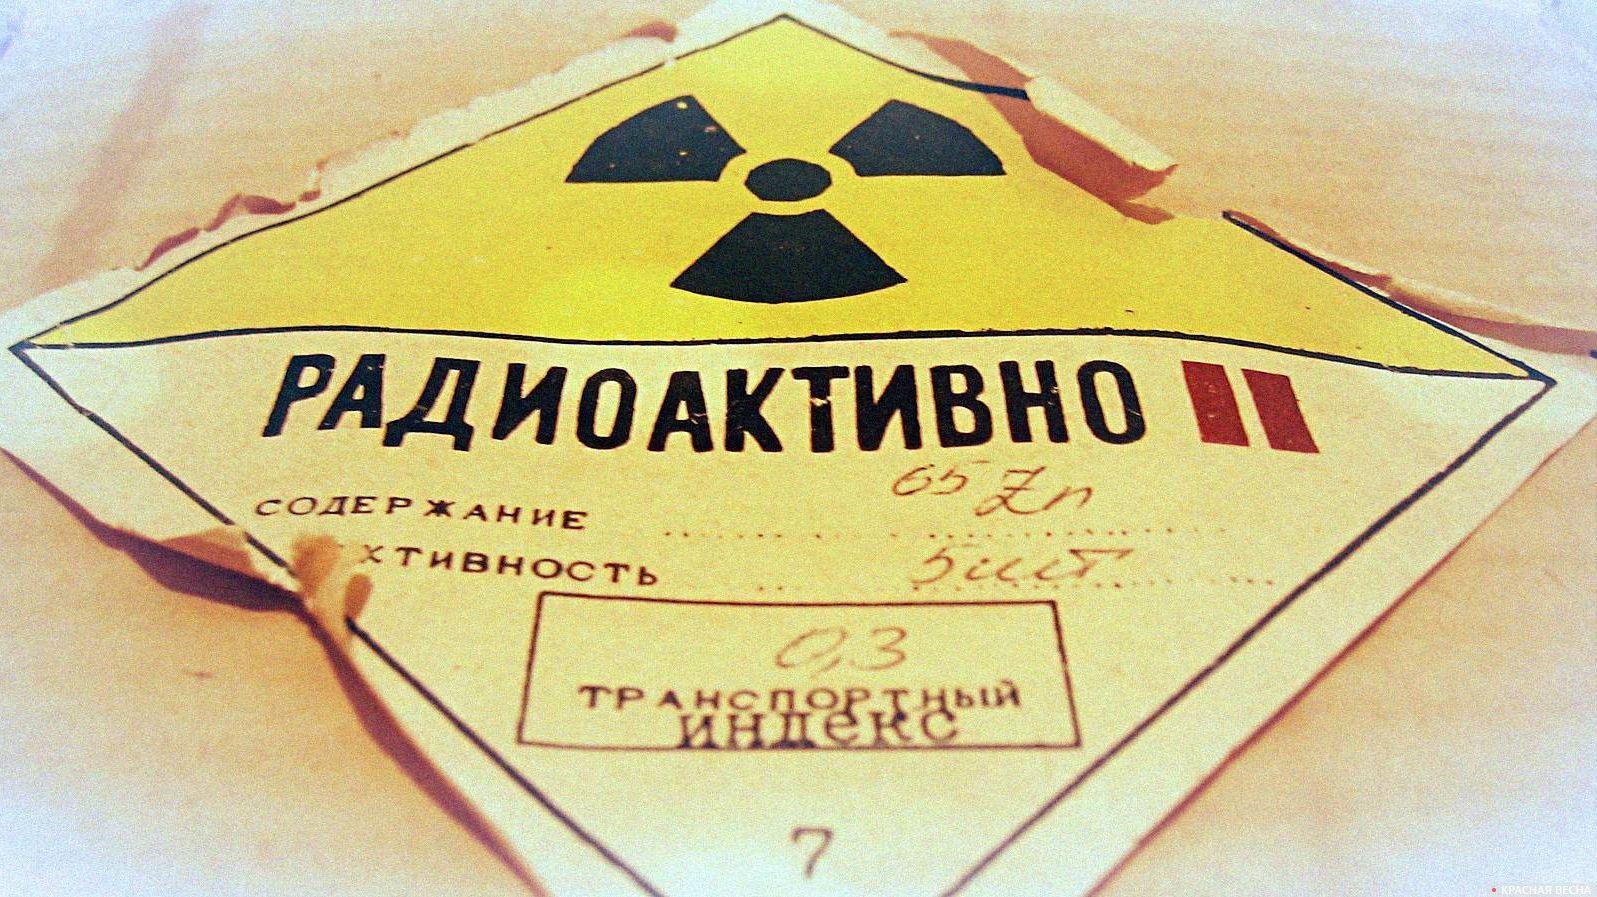 Коробка со знаком радиоактивность